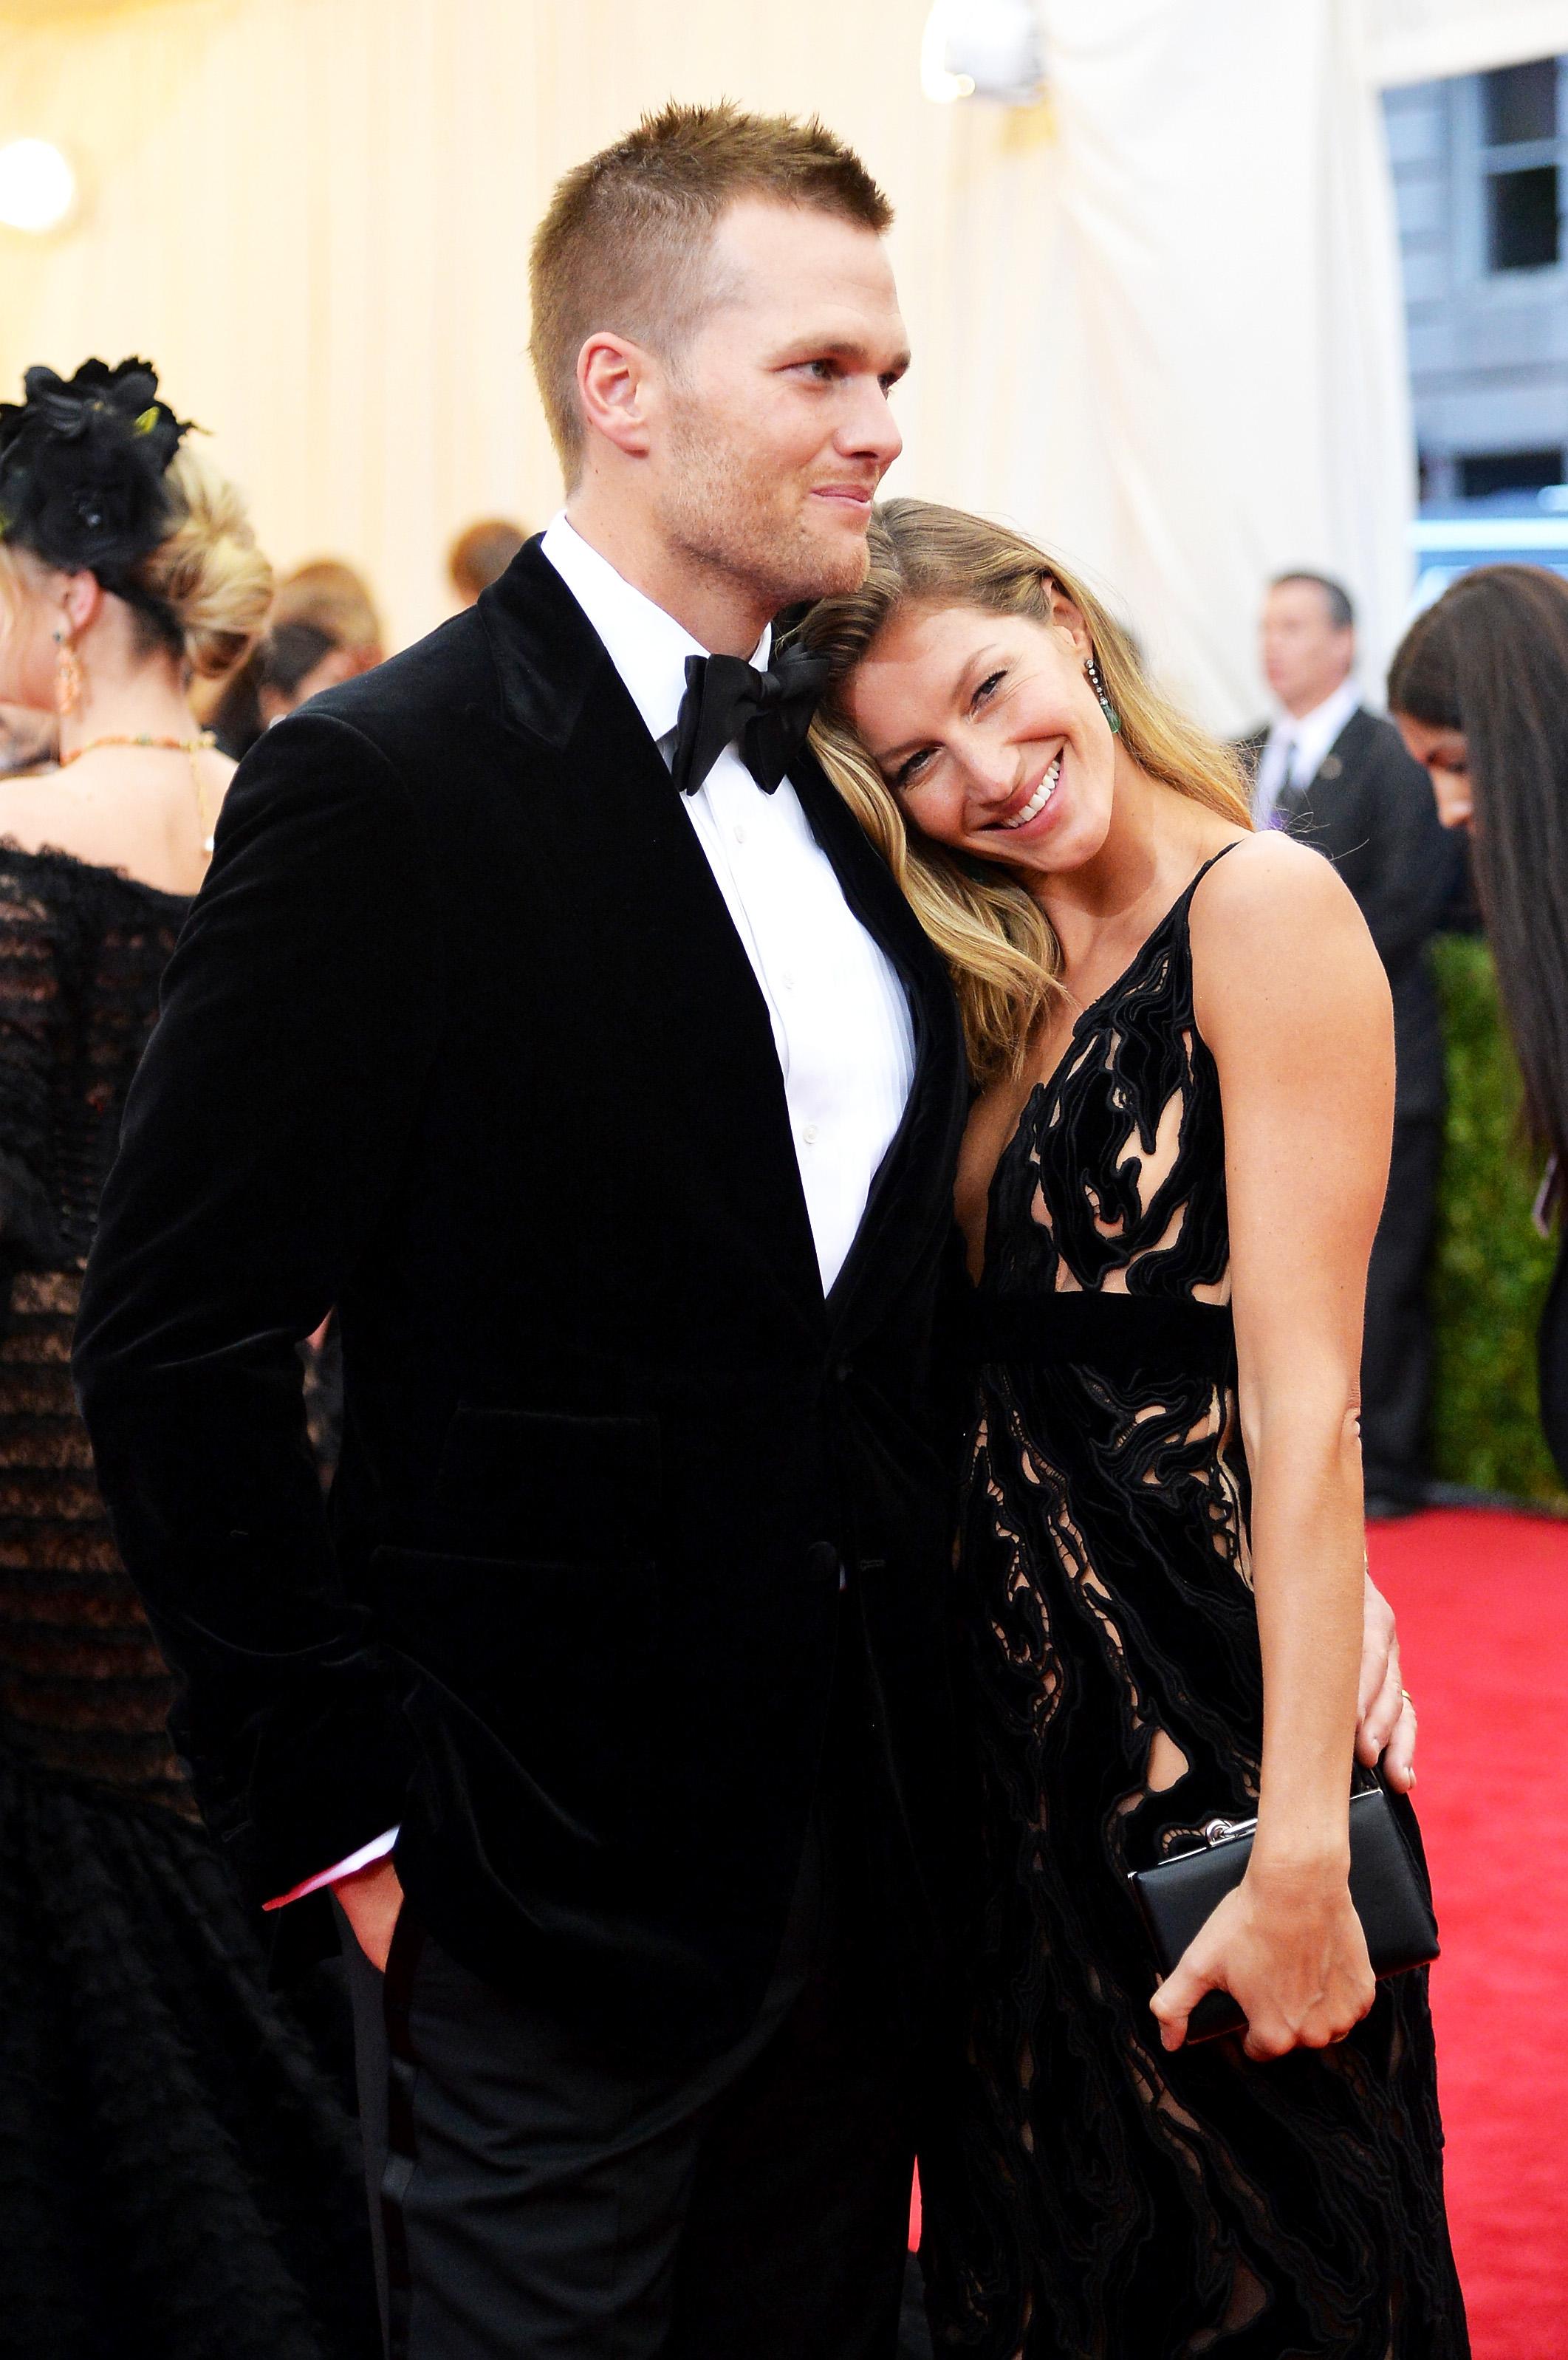 Tom Brady and Gisele Bündchen Argue Over His Retirement